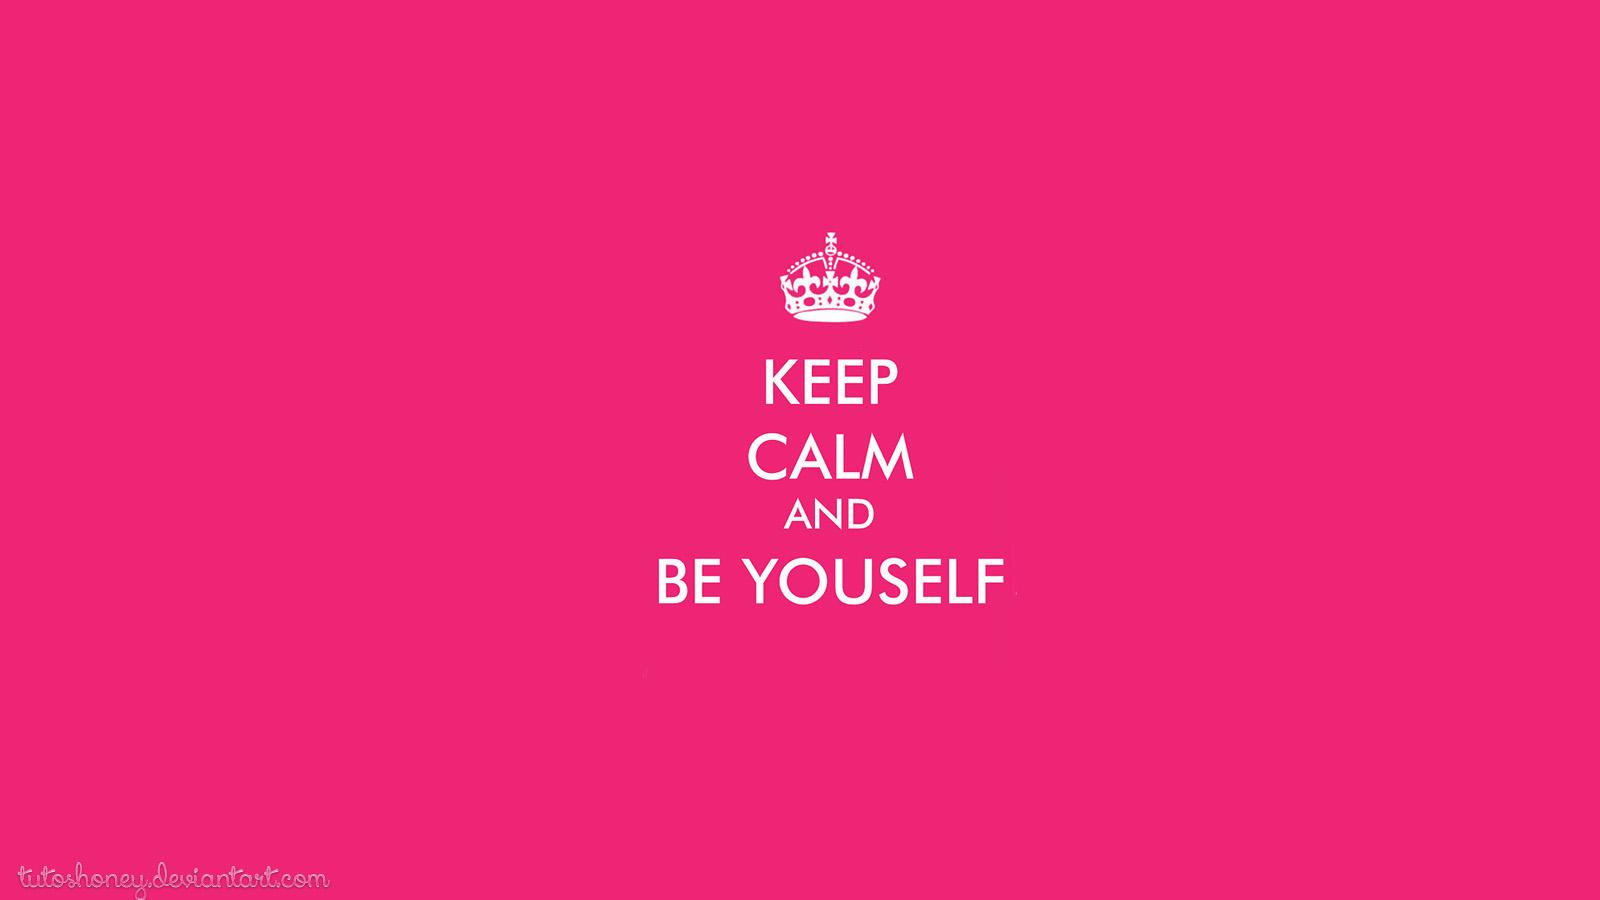 keep calm wallpaper free